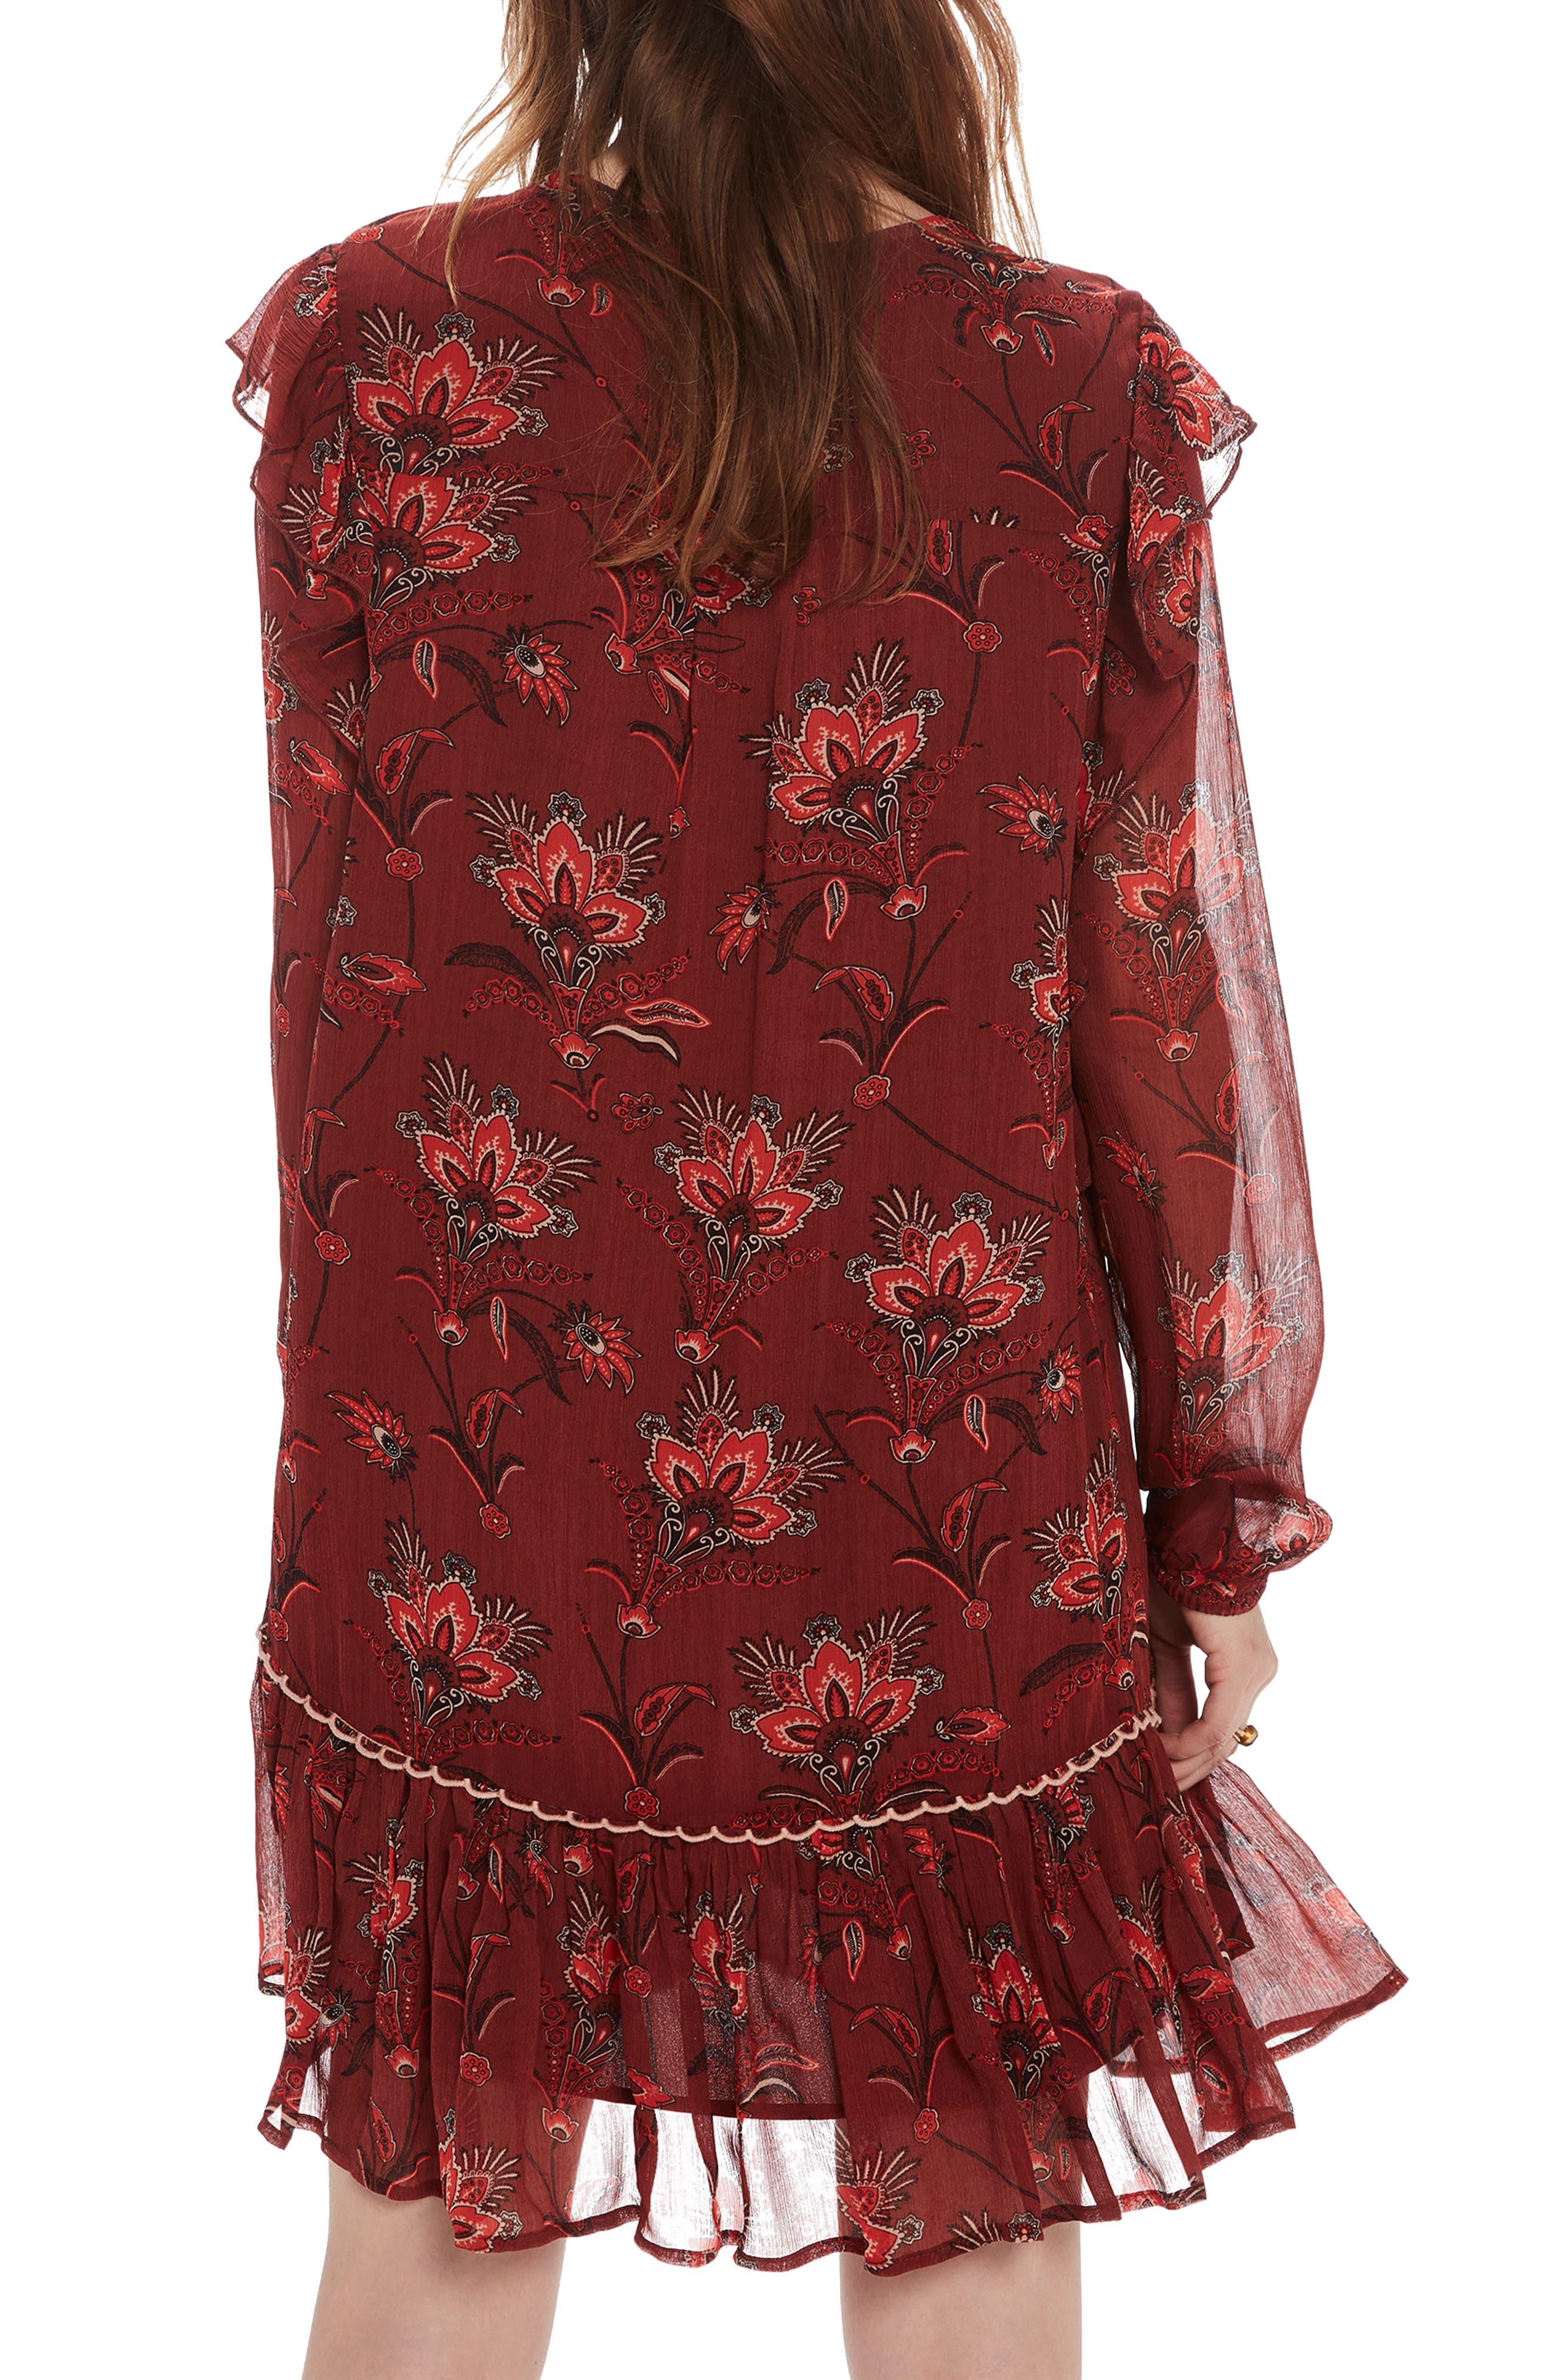 SCOTCH & SODA,                             Print Drop Hem Dress,                             Alternate thumbnail 2, color,                             931